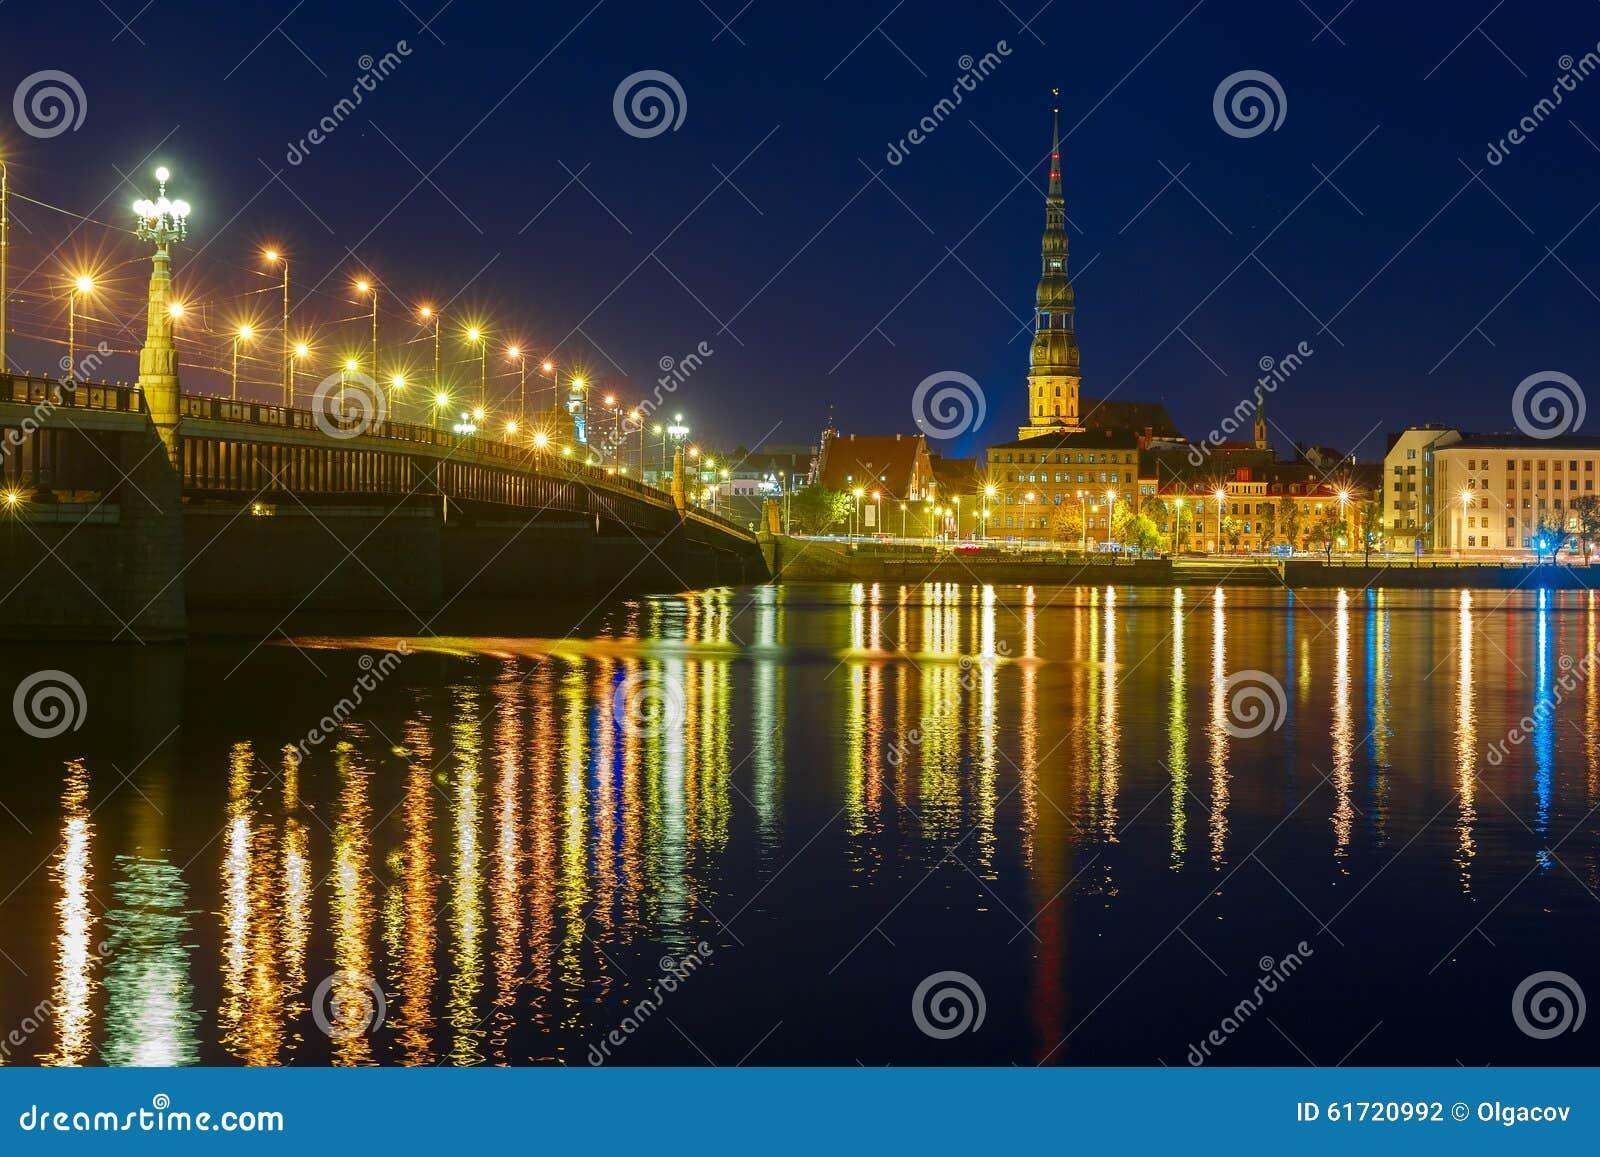 Download Old Town And River Daugava At Night, Riga, Latvia Stock Photo - Image of bridge, europe: 61720992